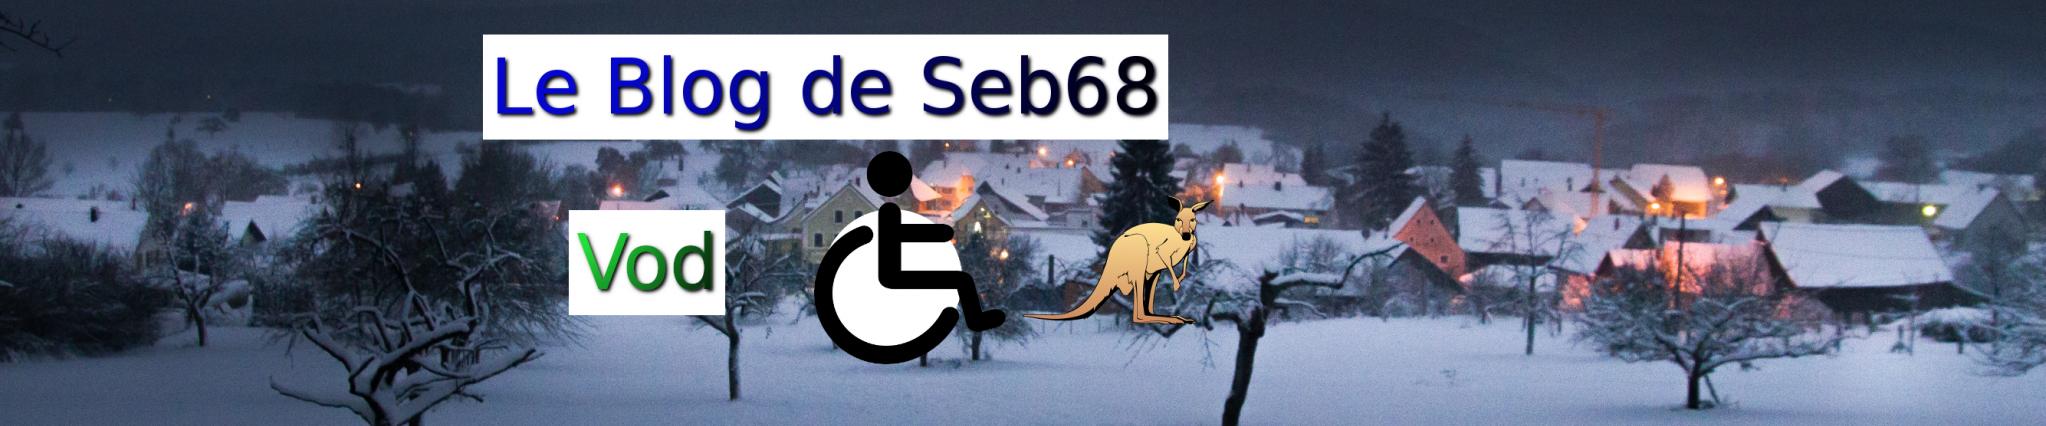 Le blog de seb68